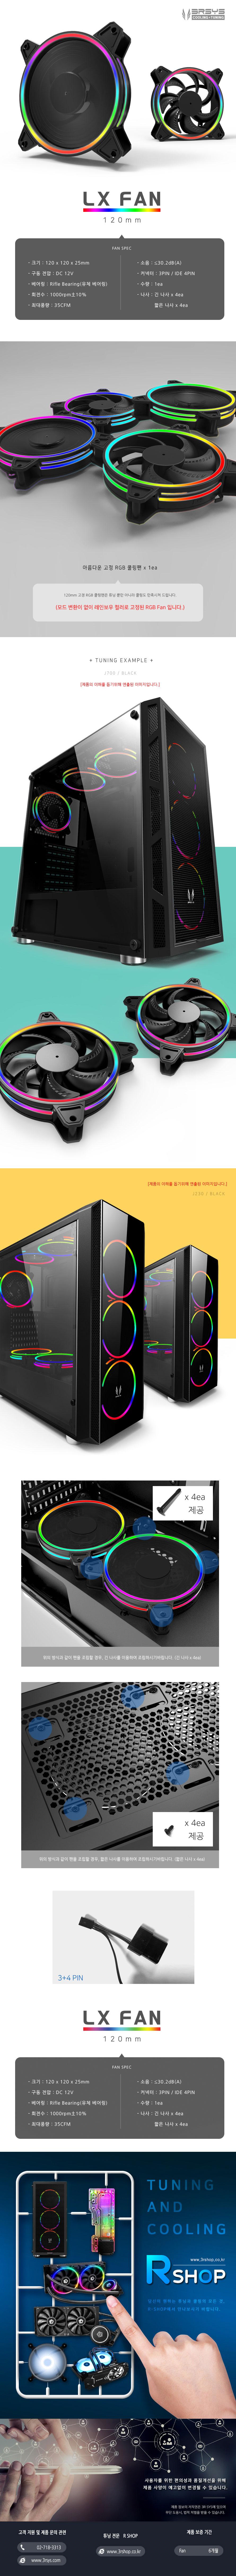 3RSYS  LX FAN RGB